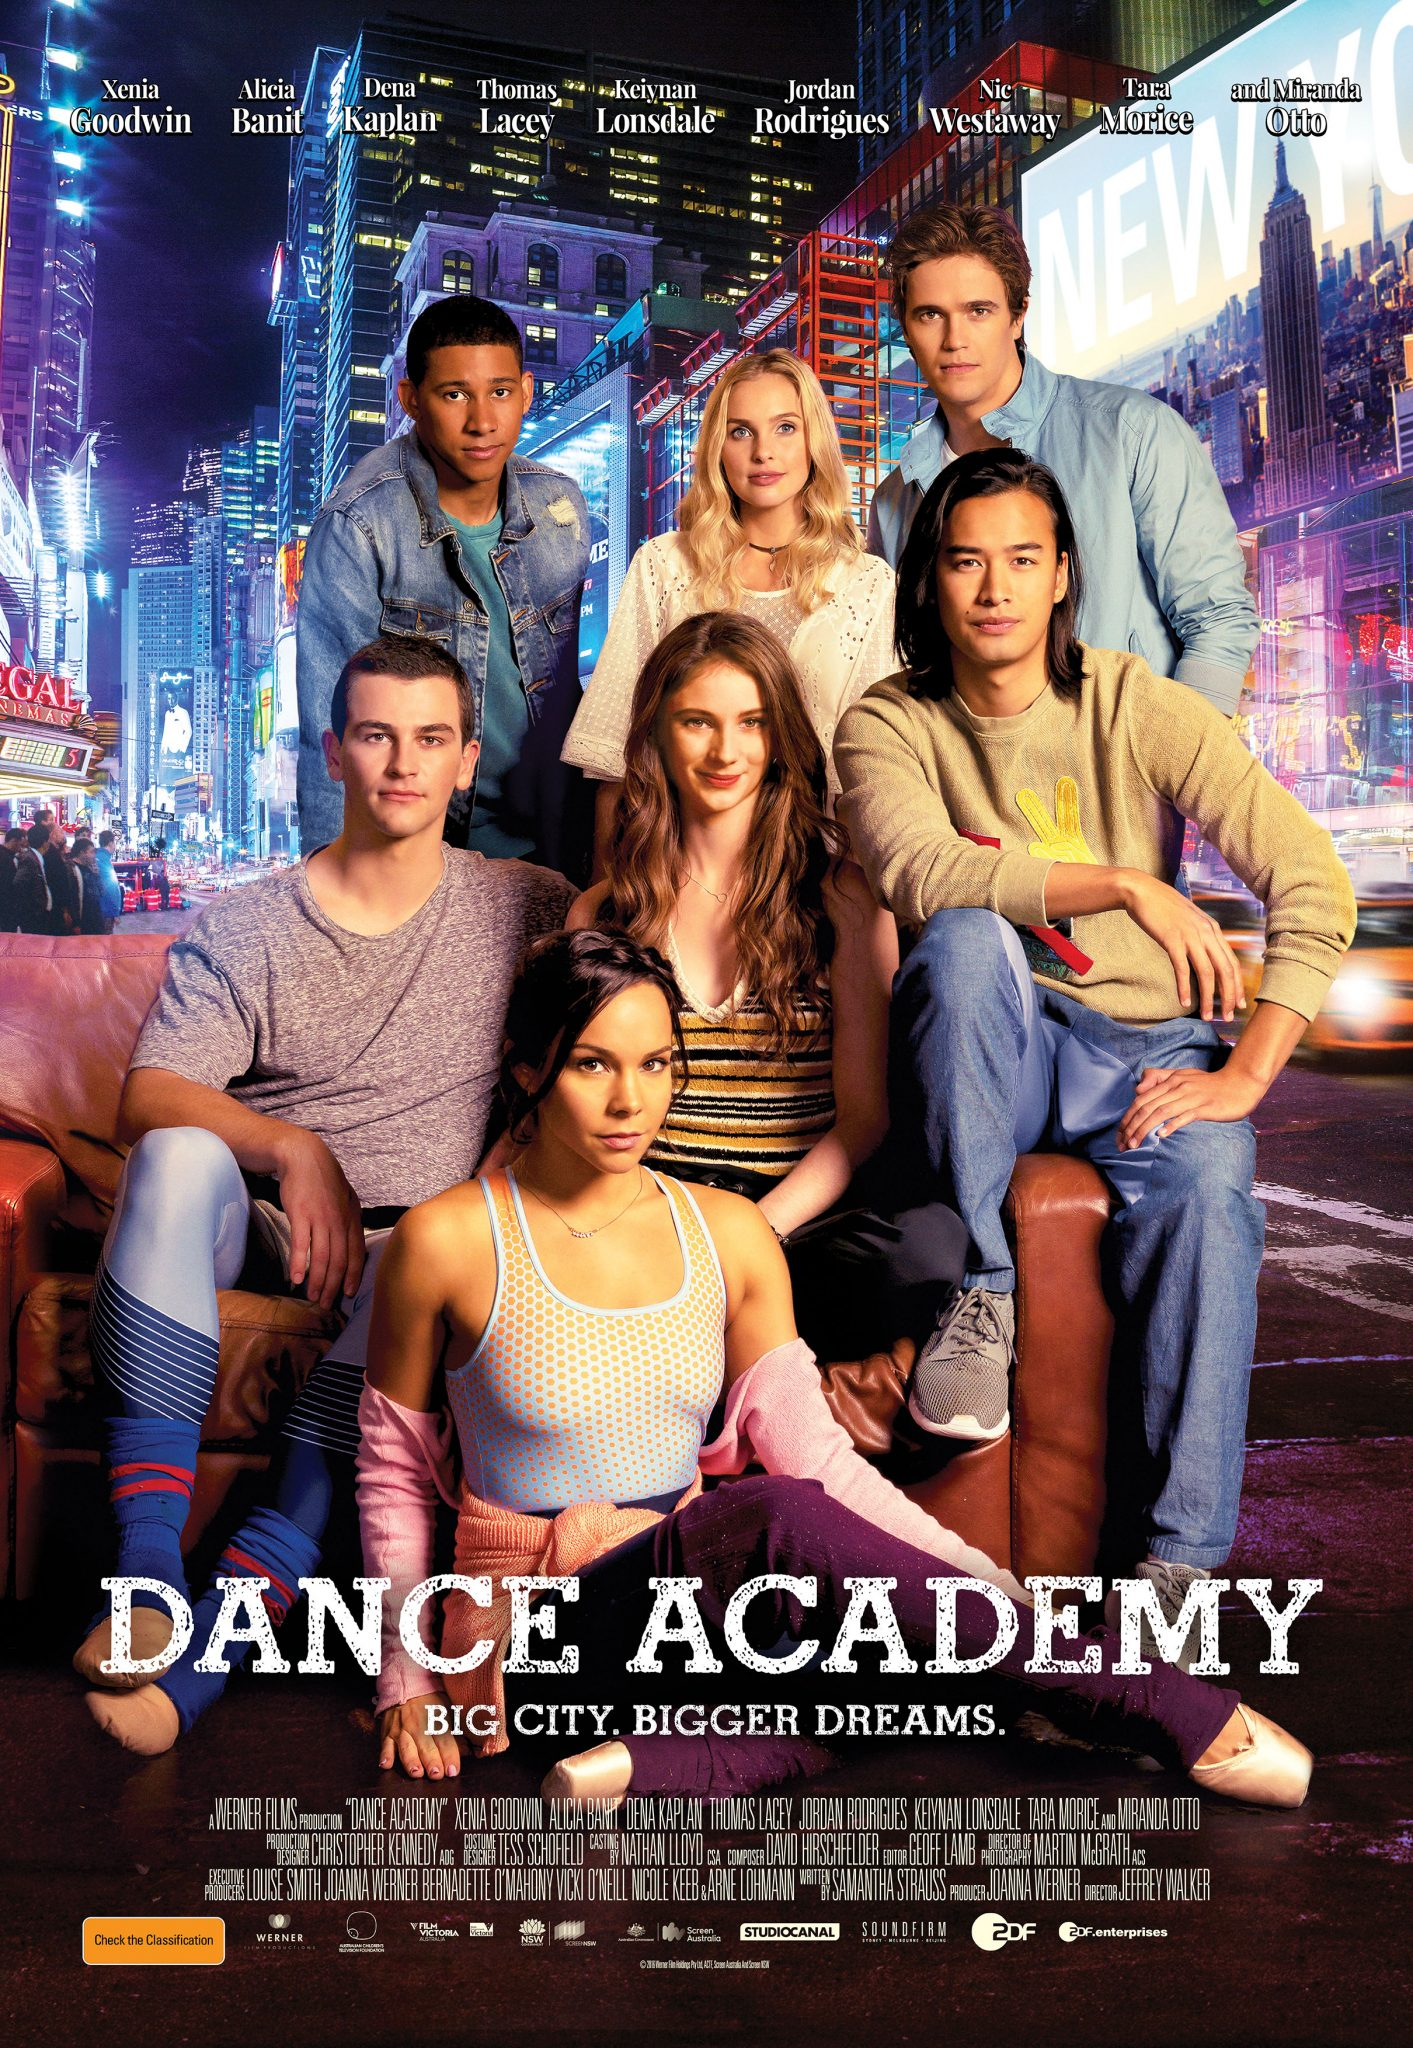 DanceAcademy_A4poster